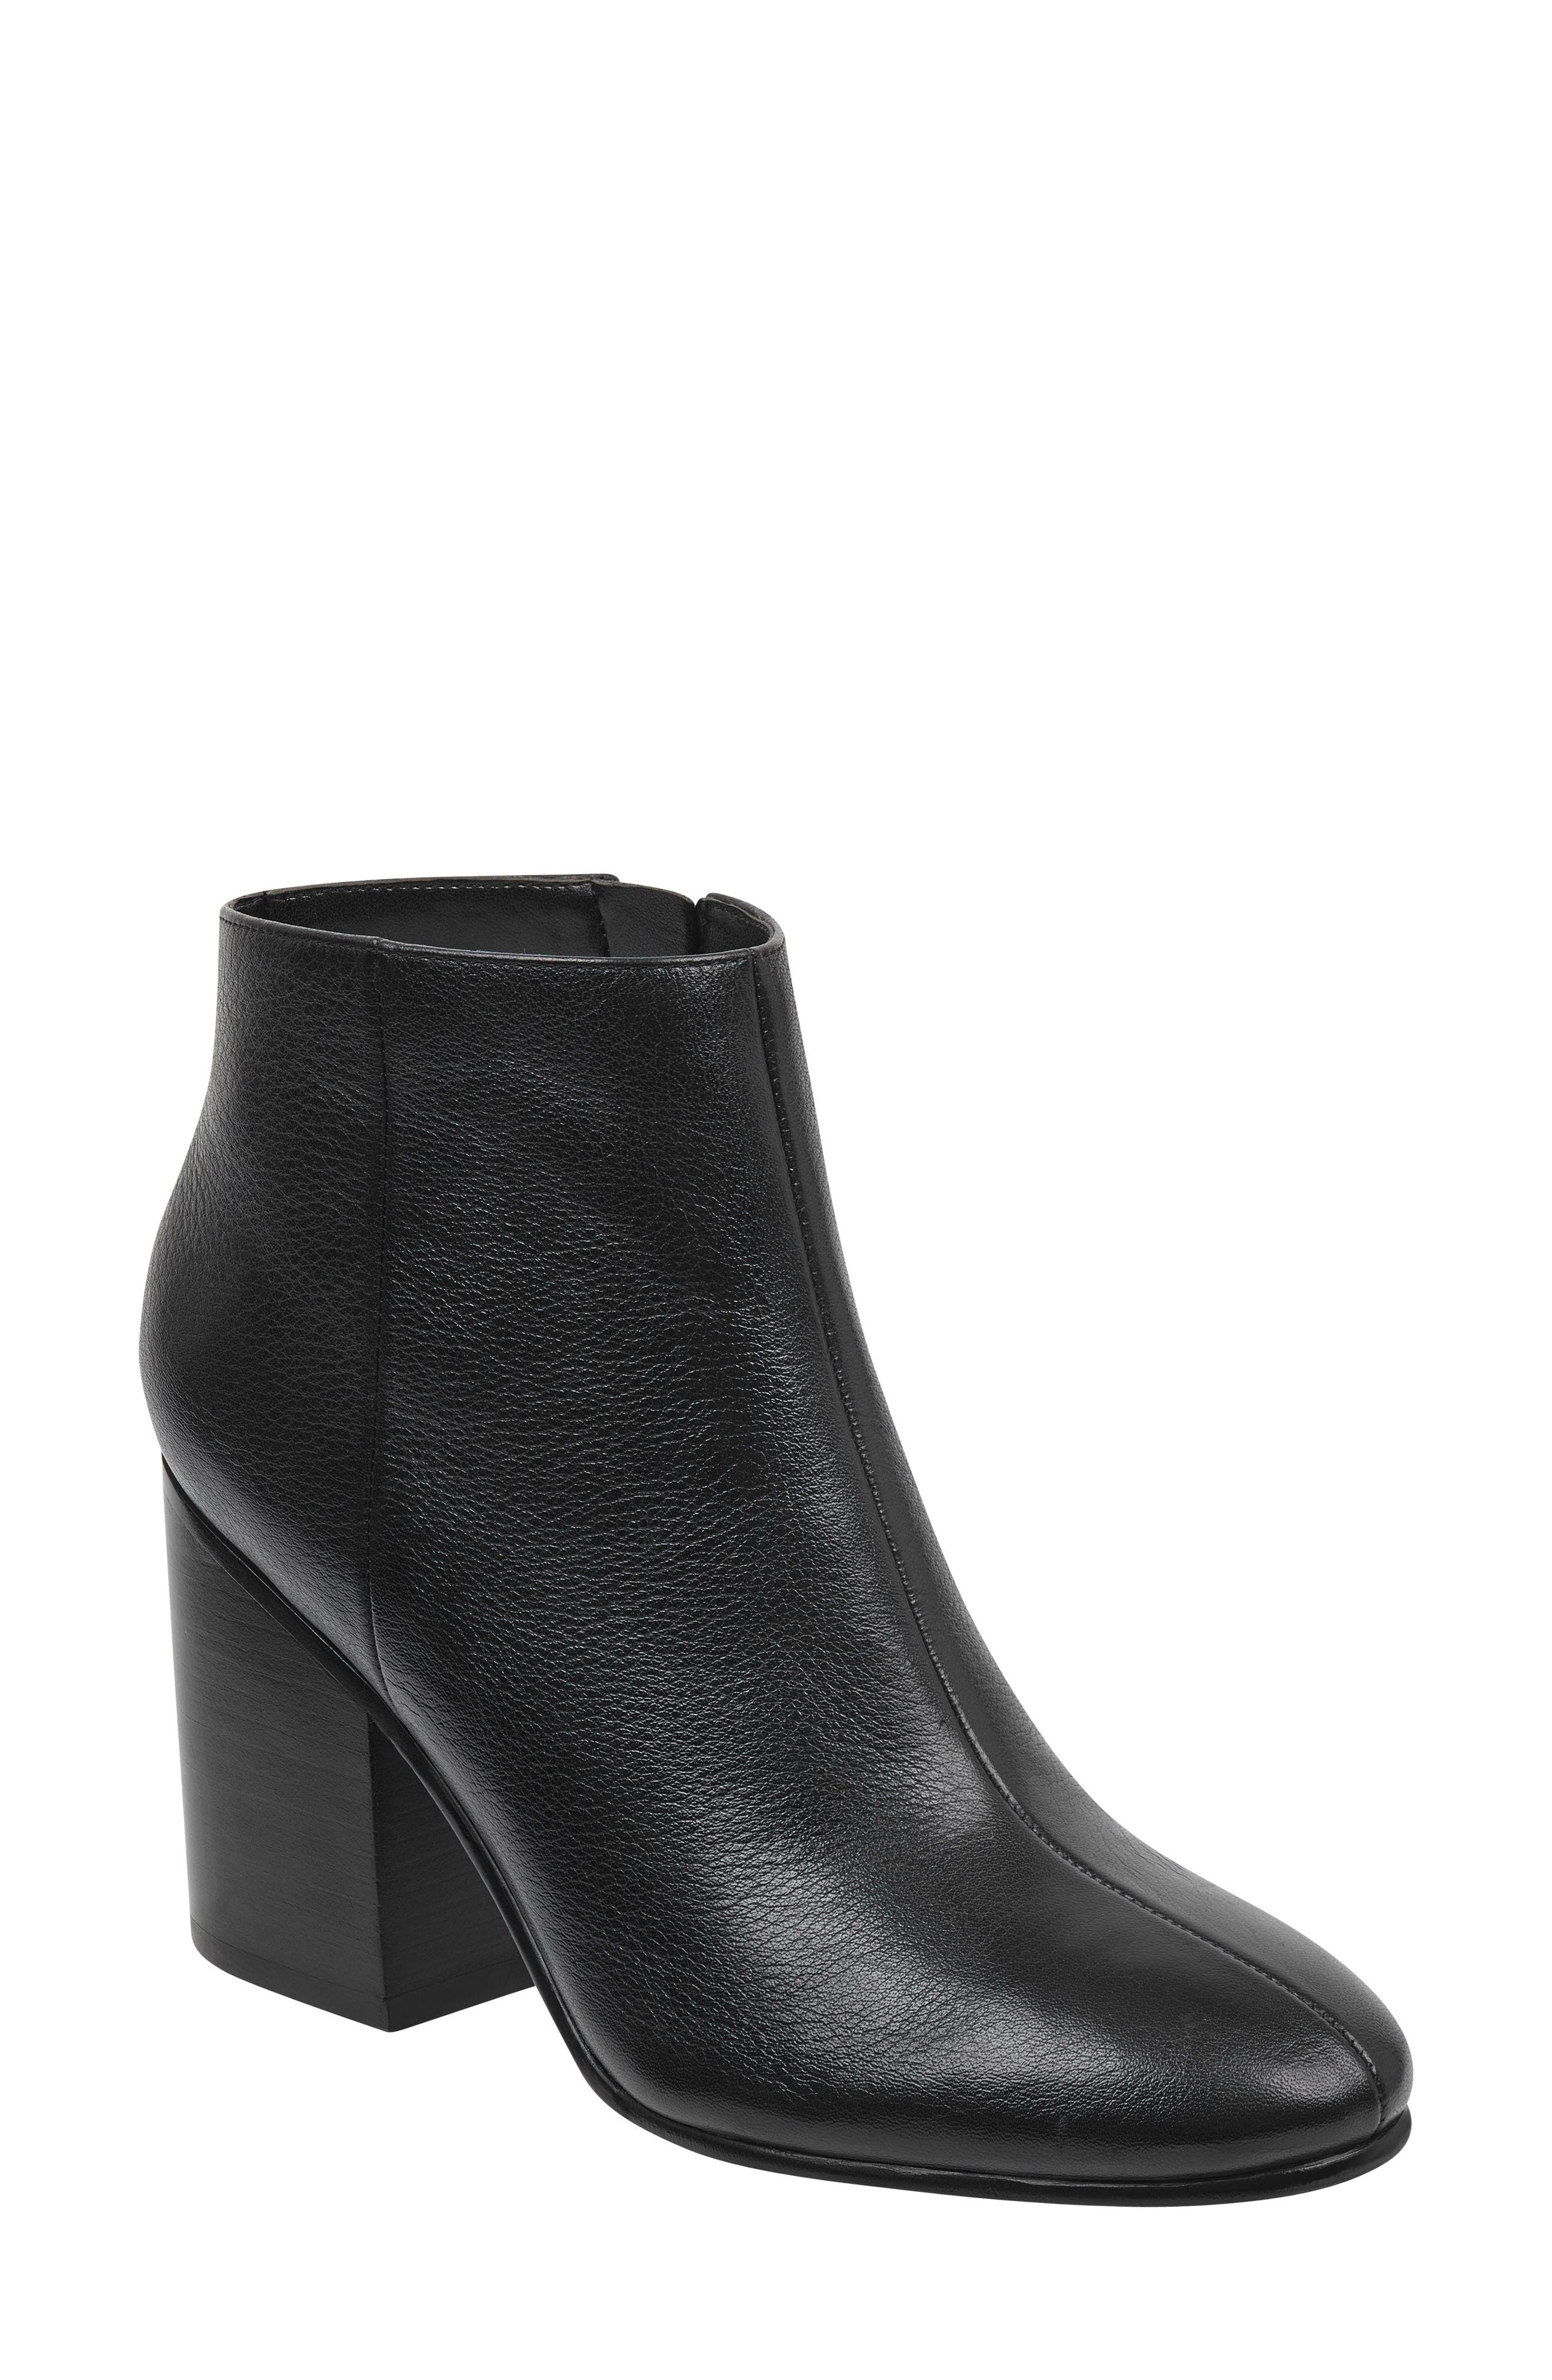 Quella Bootie,                         Main,                         color, Black Leather